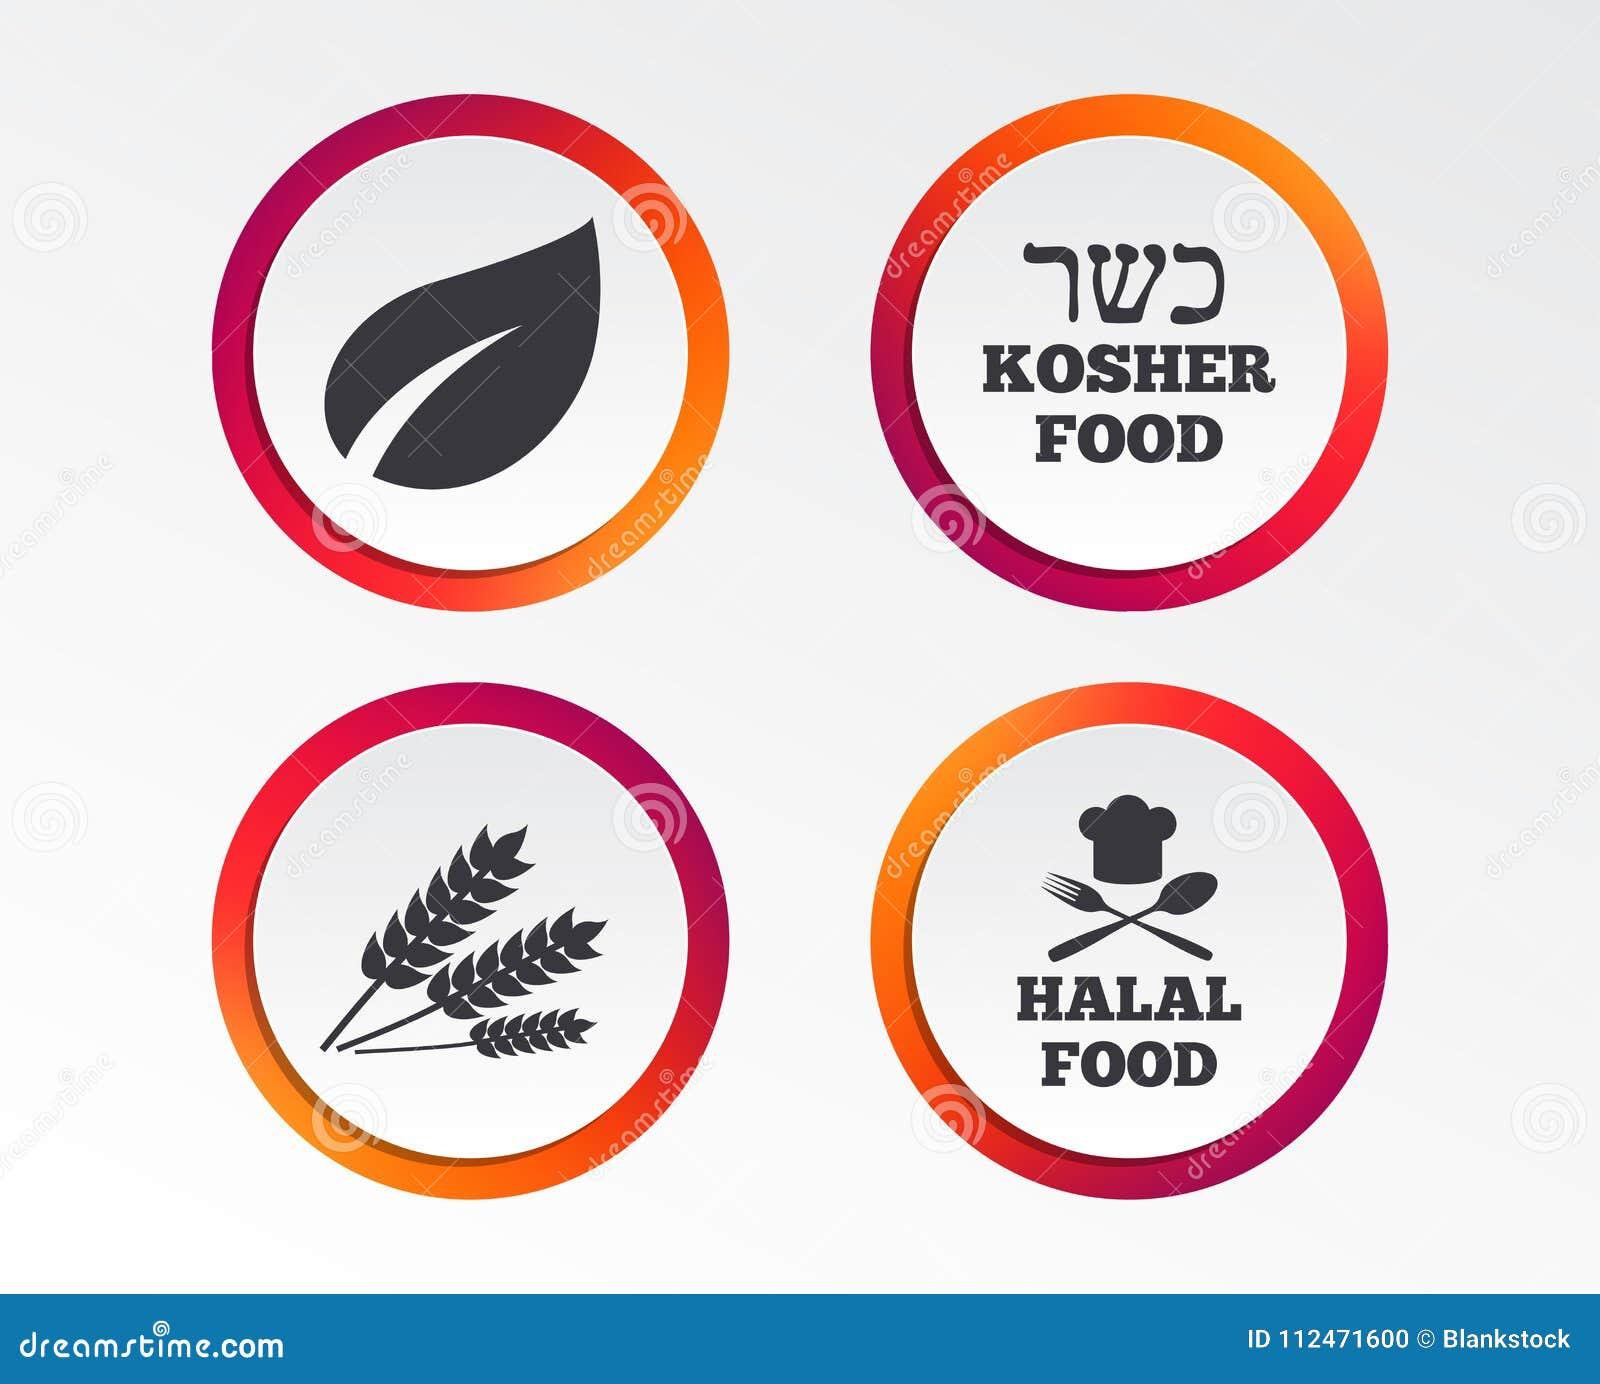 Kosher Signs On Food Labels Cor View Of Cor Kosher Symbol